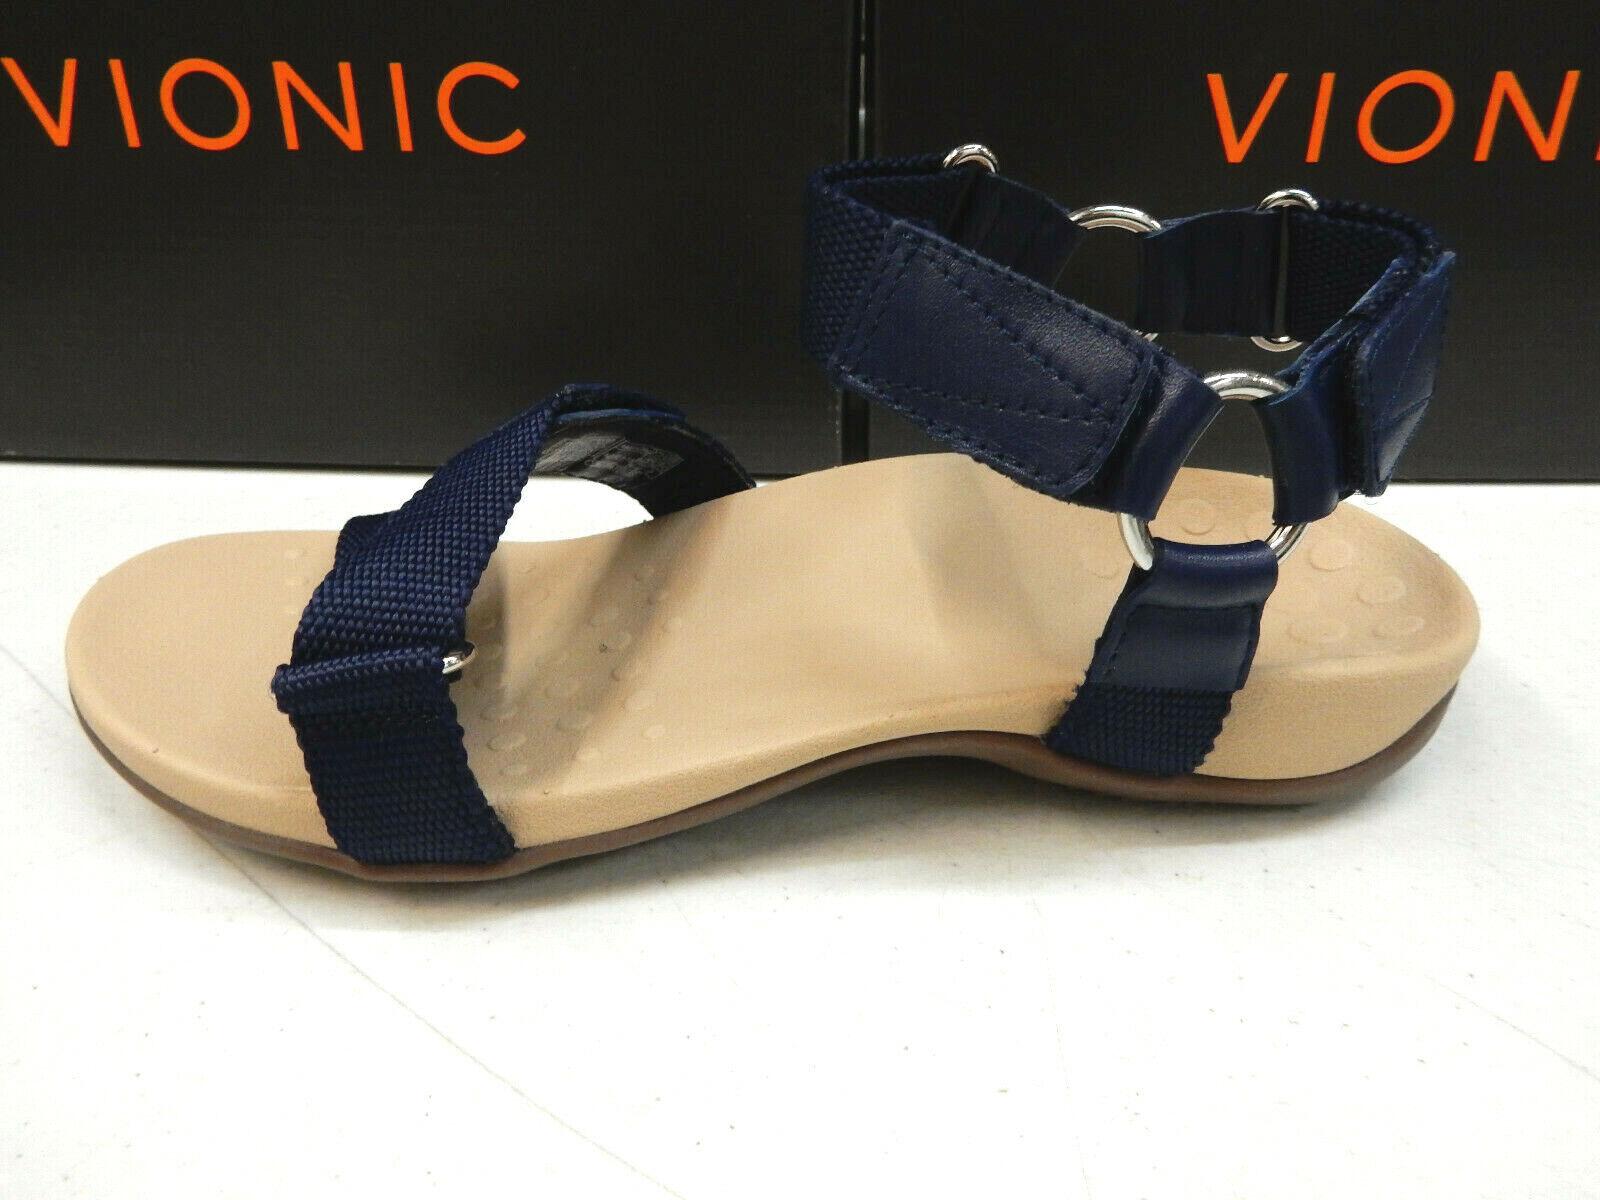 Vionic femmes Candace Backstrap Sandal Navy Taille 10